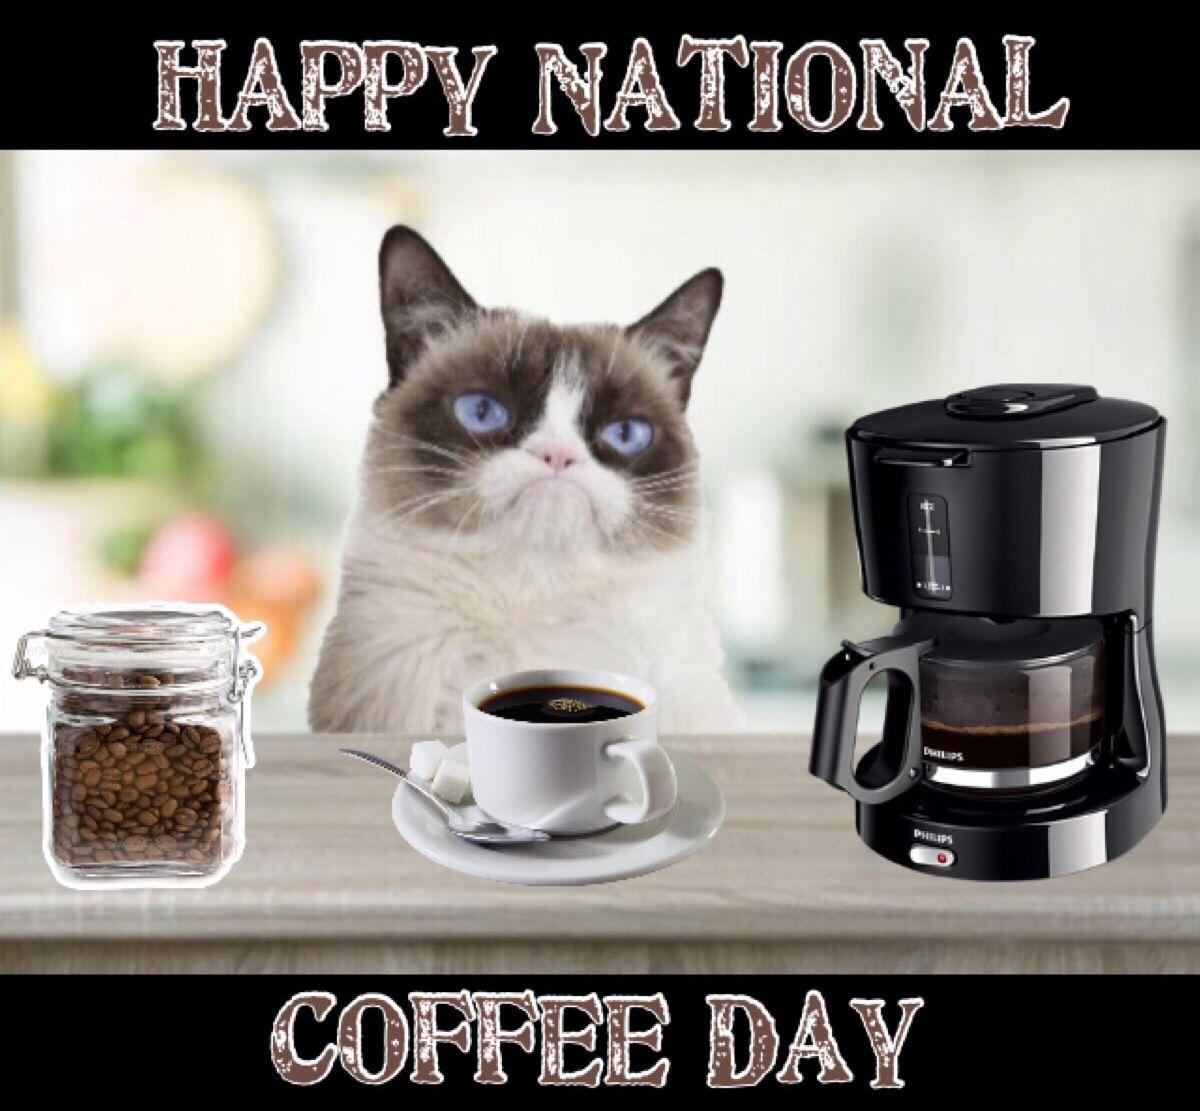 Happy National Coffee Day Grumpy cat, Grumpy cat humor